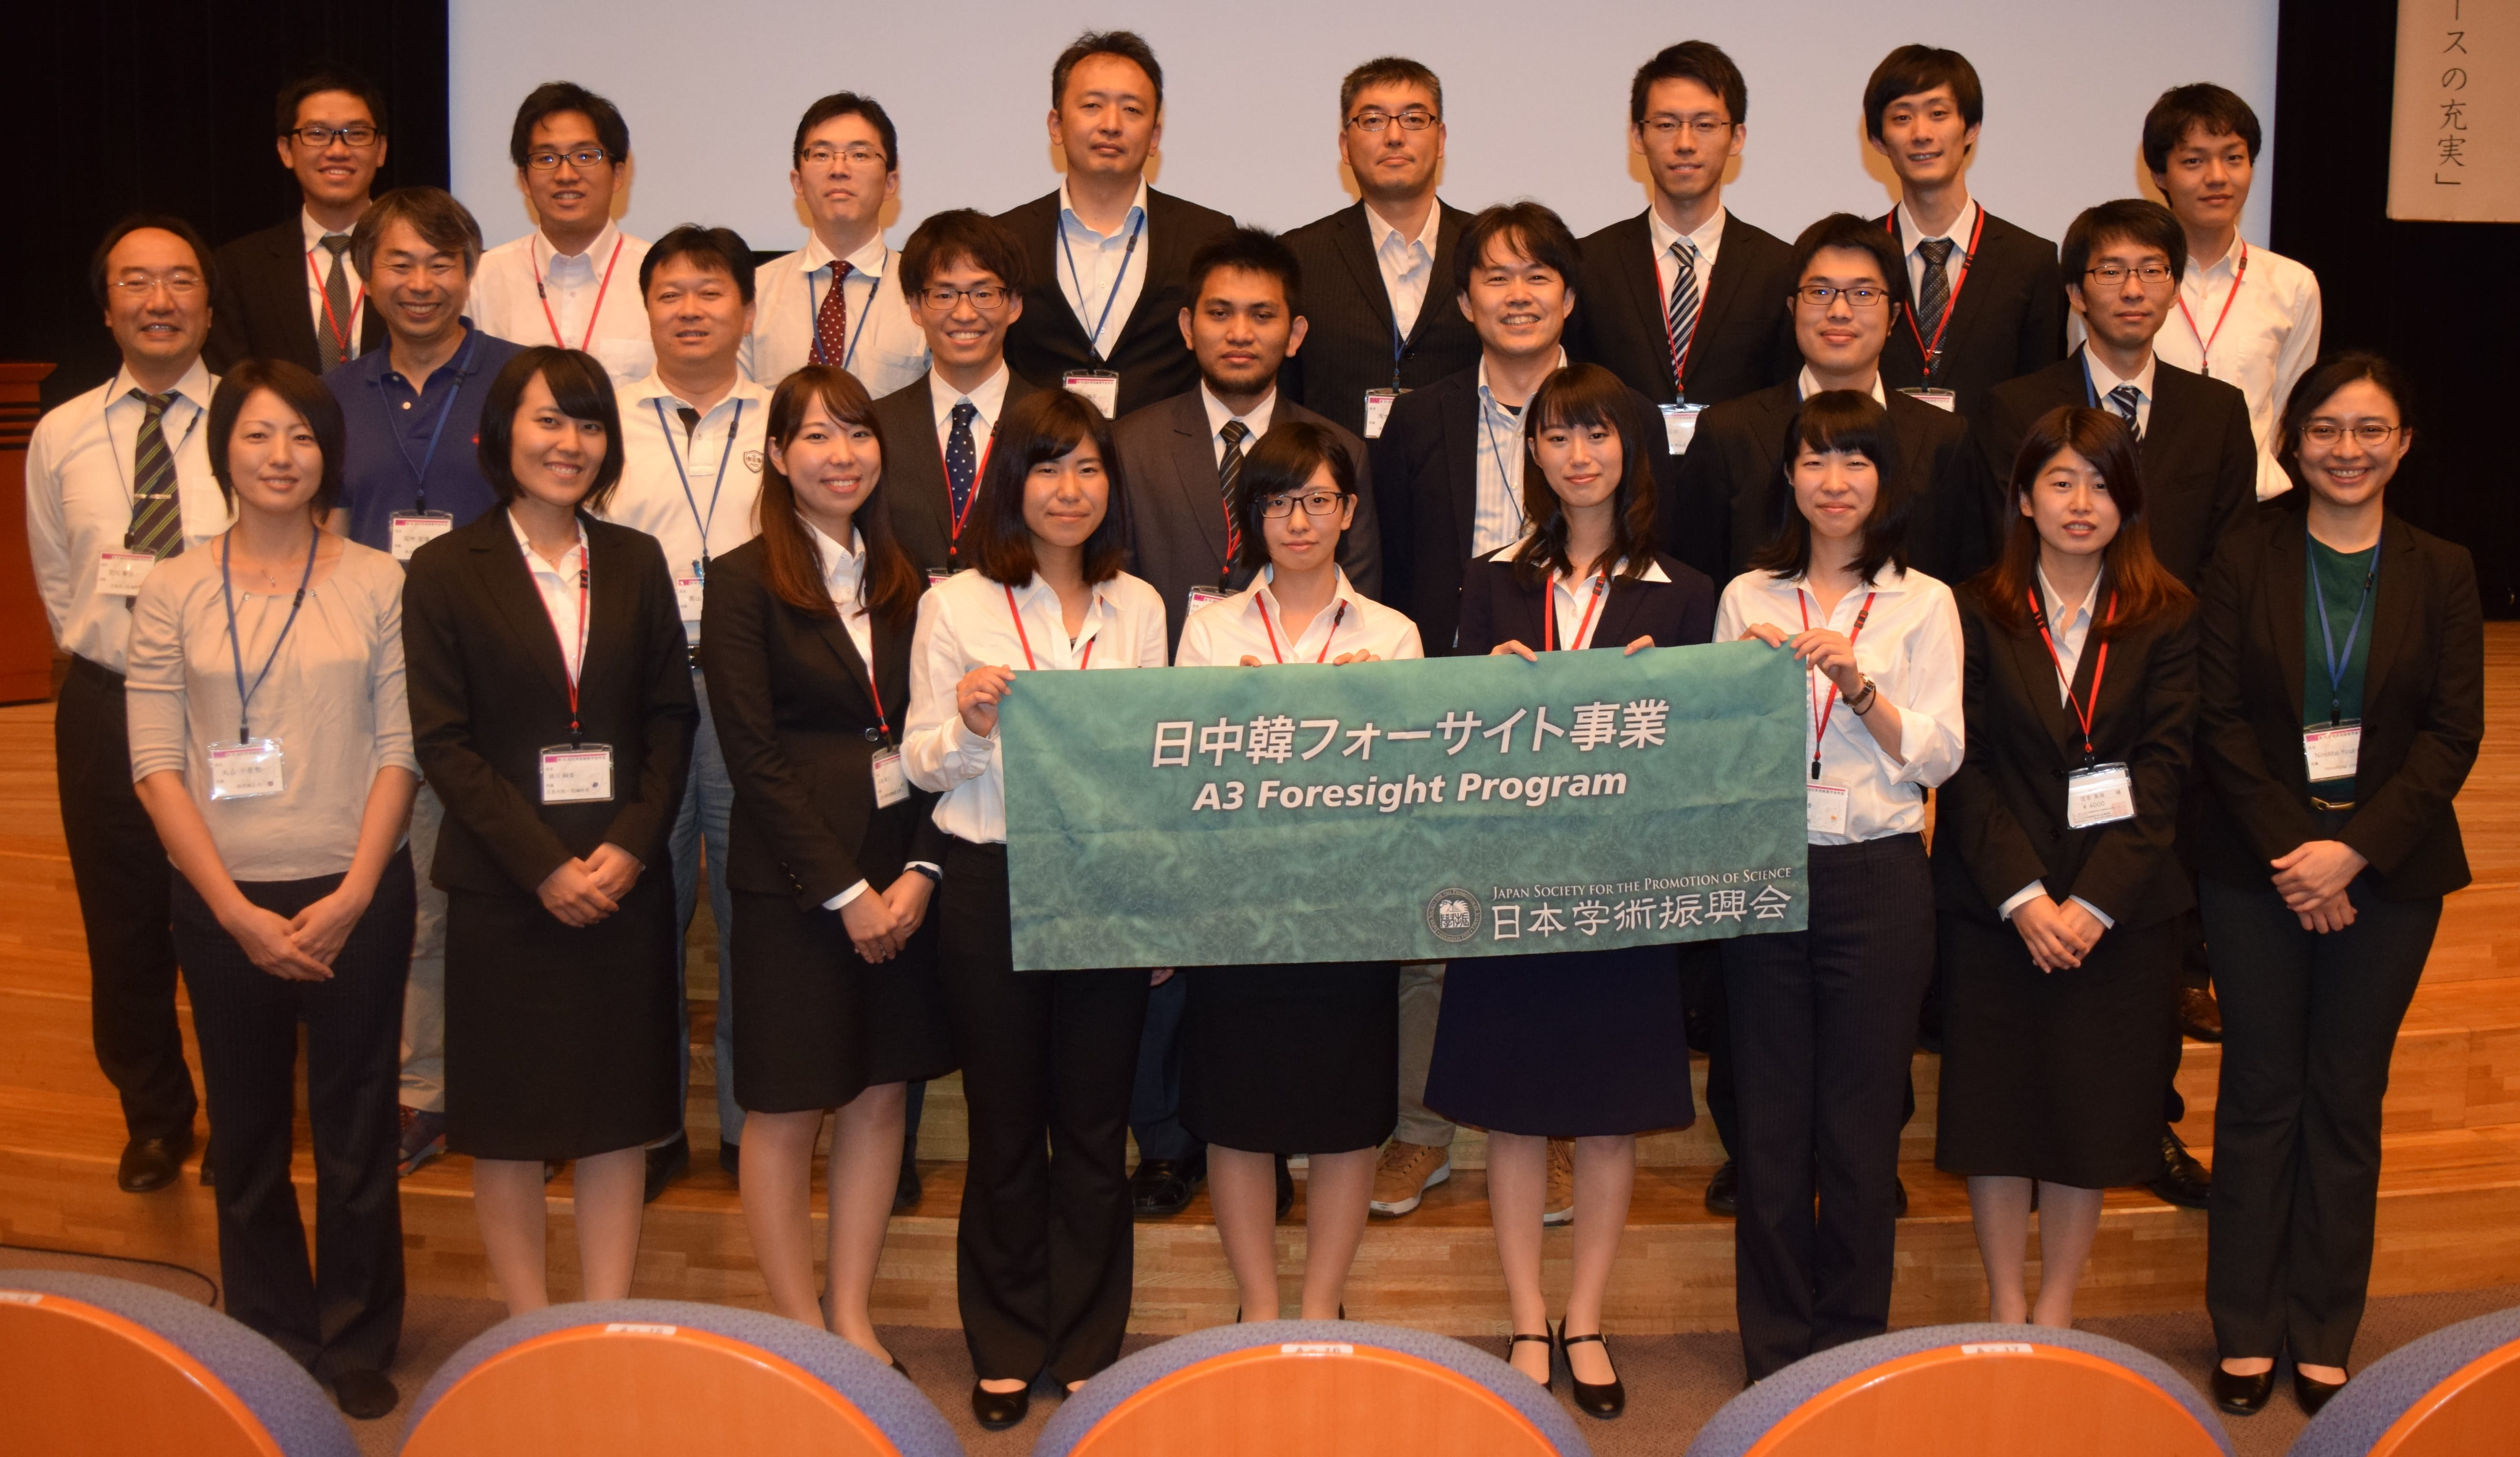 Domestic meeting in the Society for Actinomycetes Japan annual meeting, Nagano, Japan